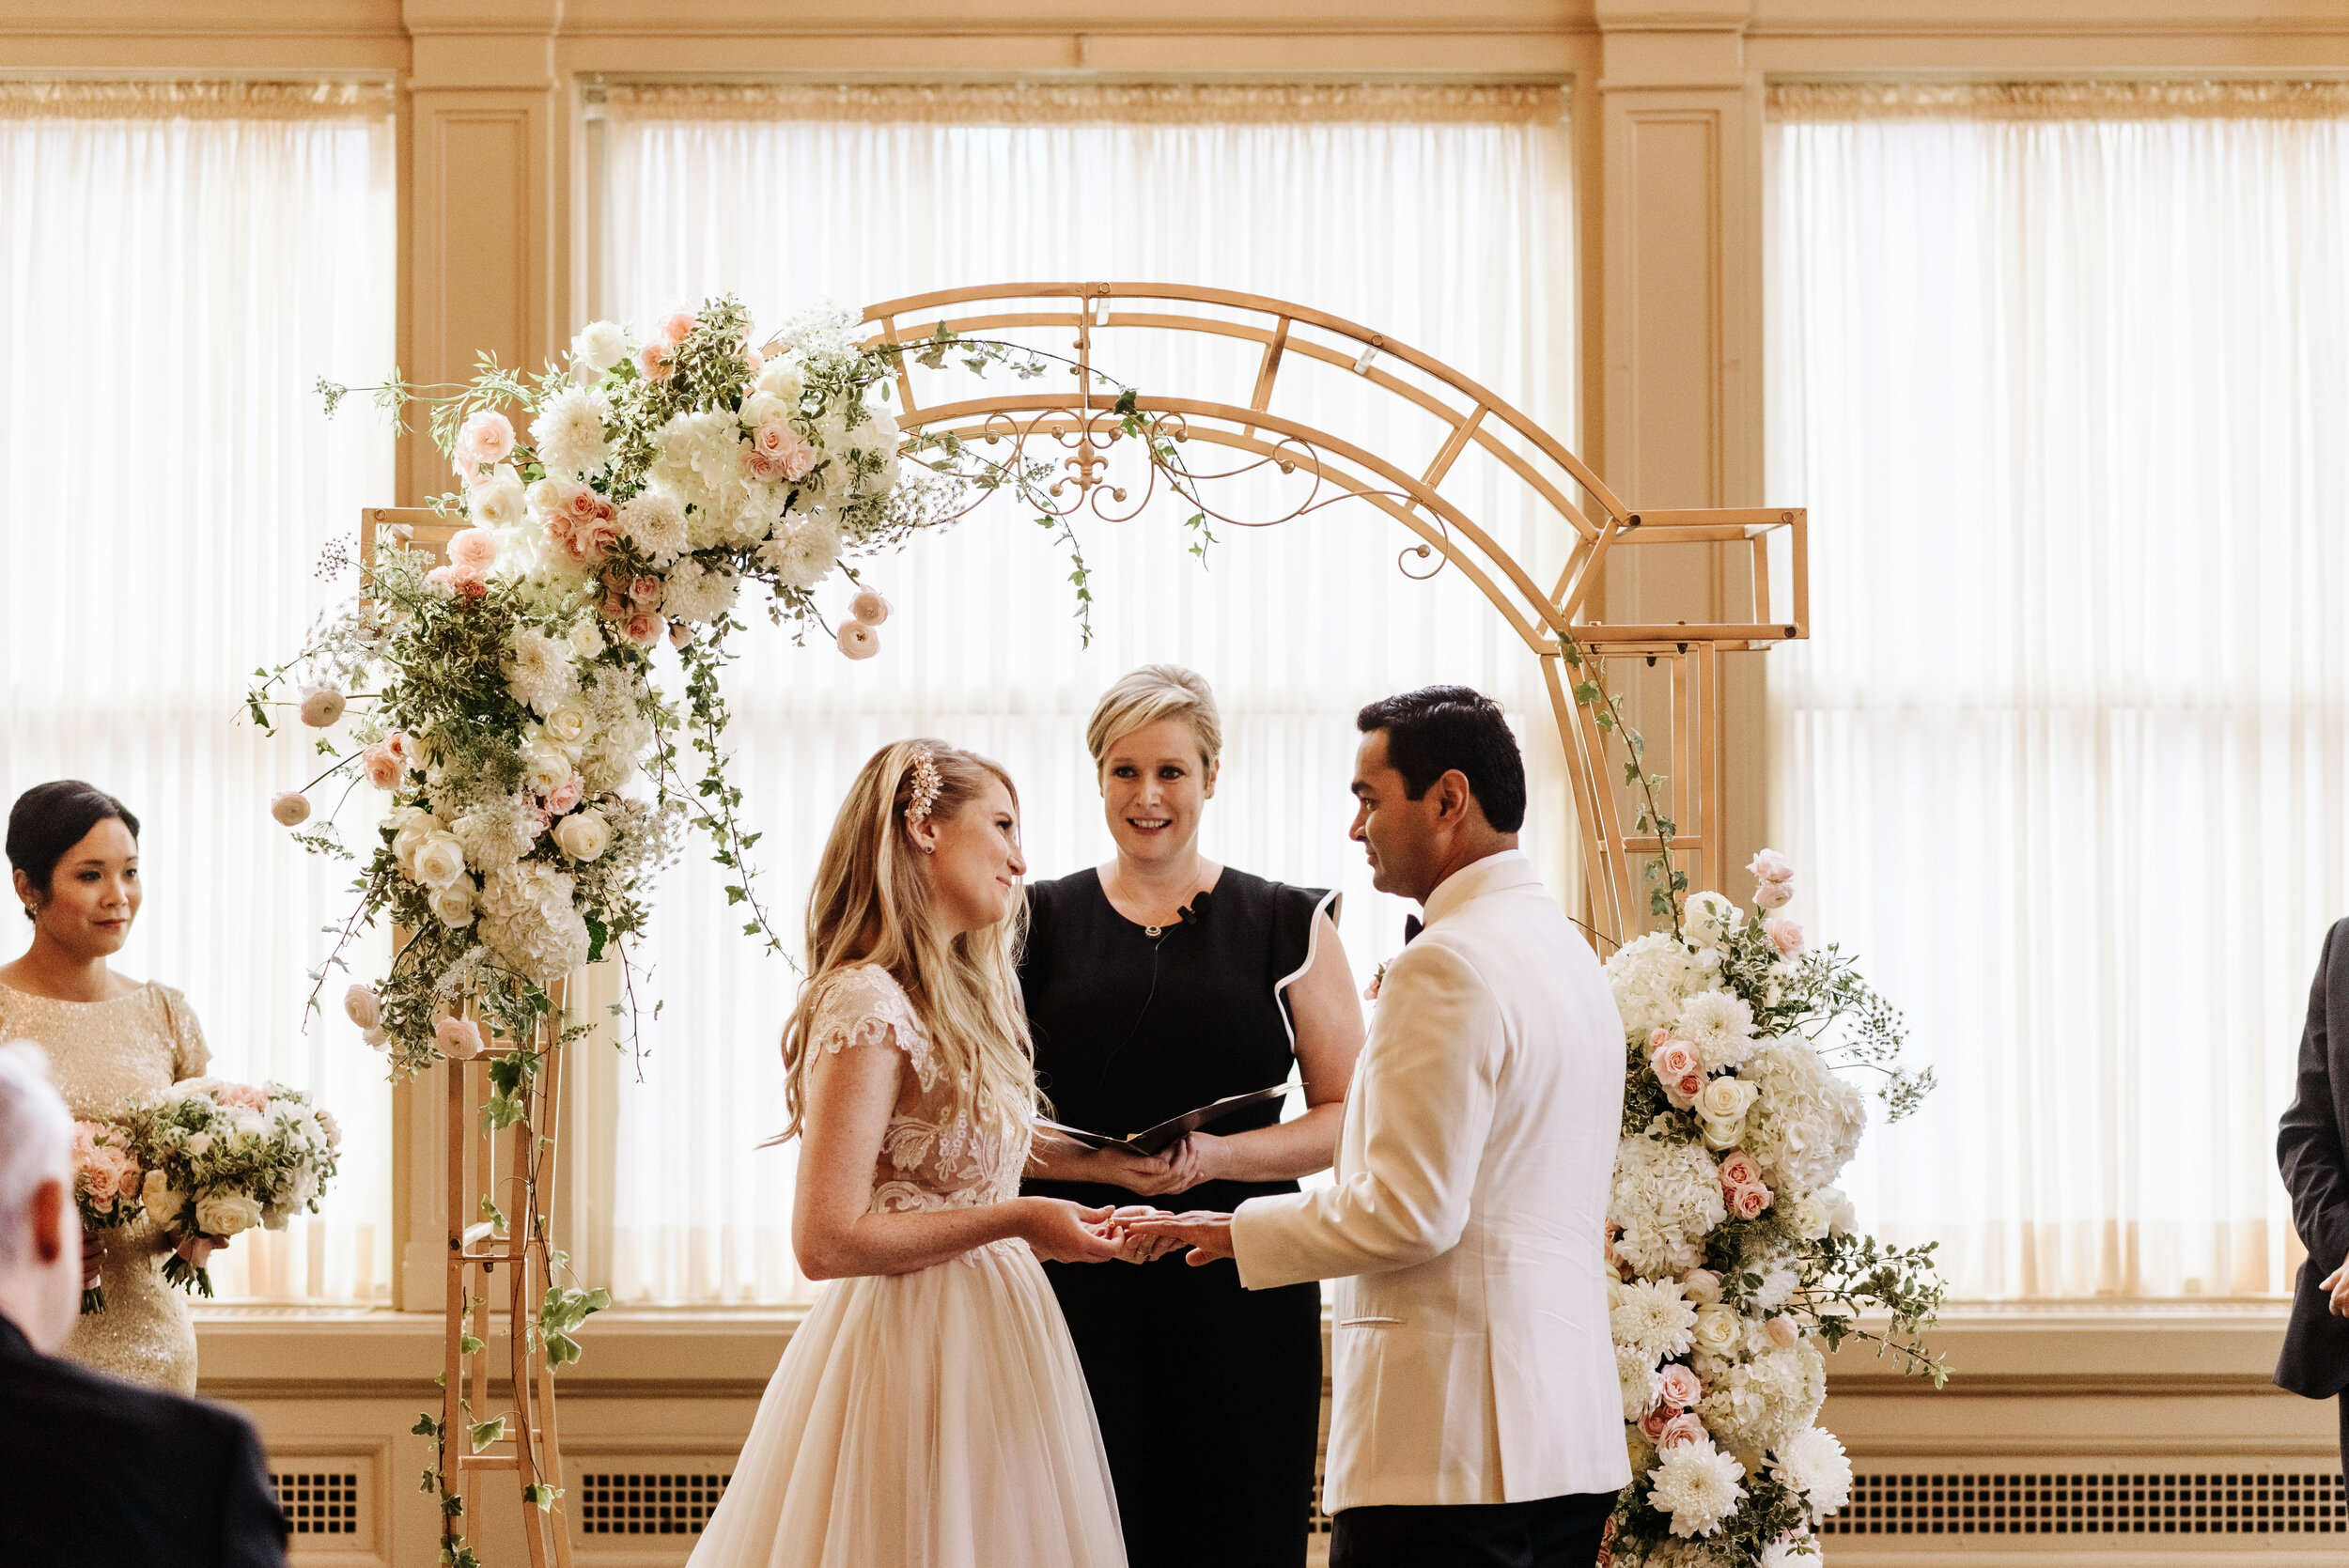 Cassie-Mrunal-Wedding-Quirk-Hotel-John-Marshall-Ballrooms-Richmond-Virginia-Photography-by-V-78.jpg